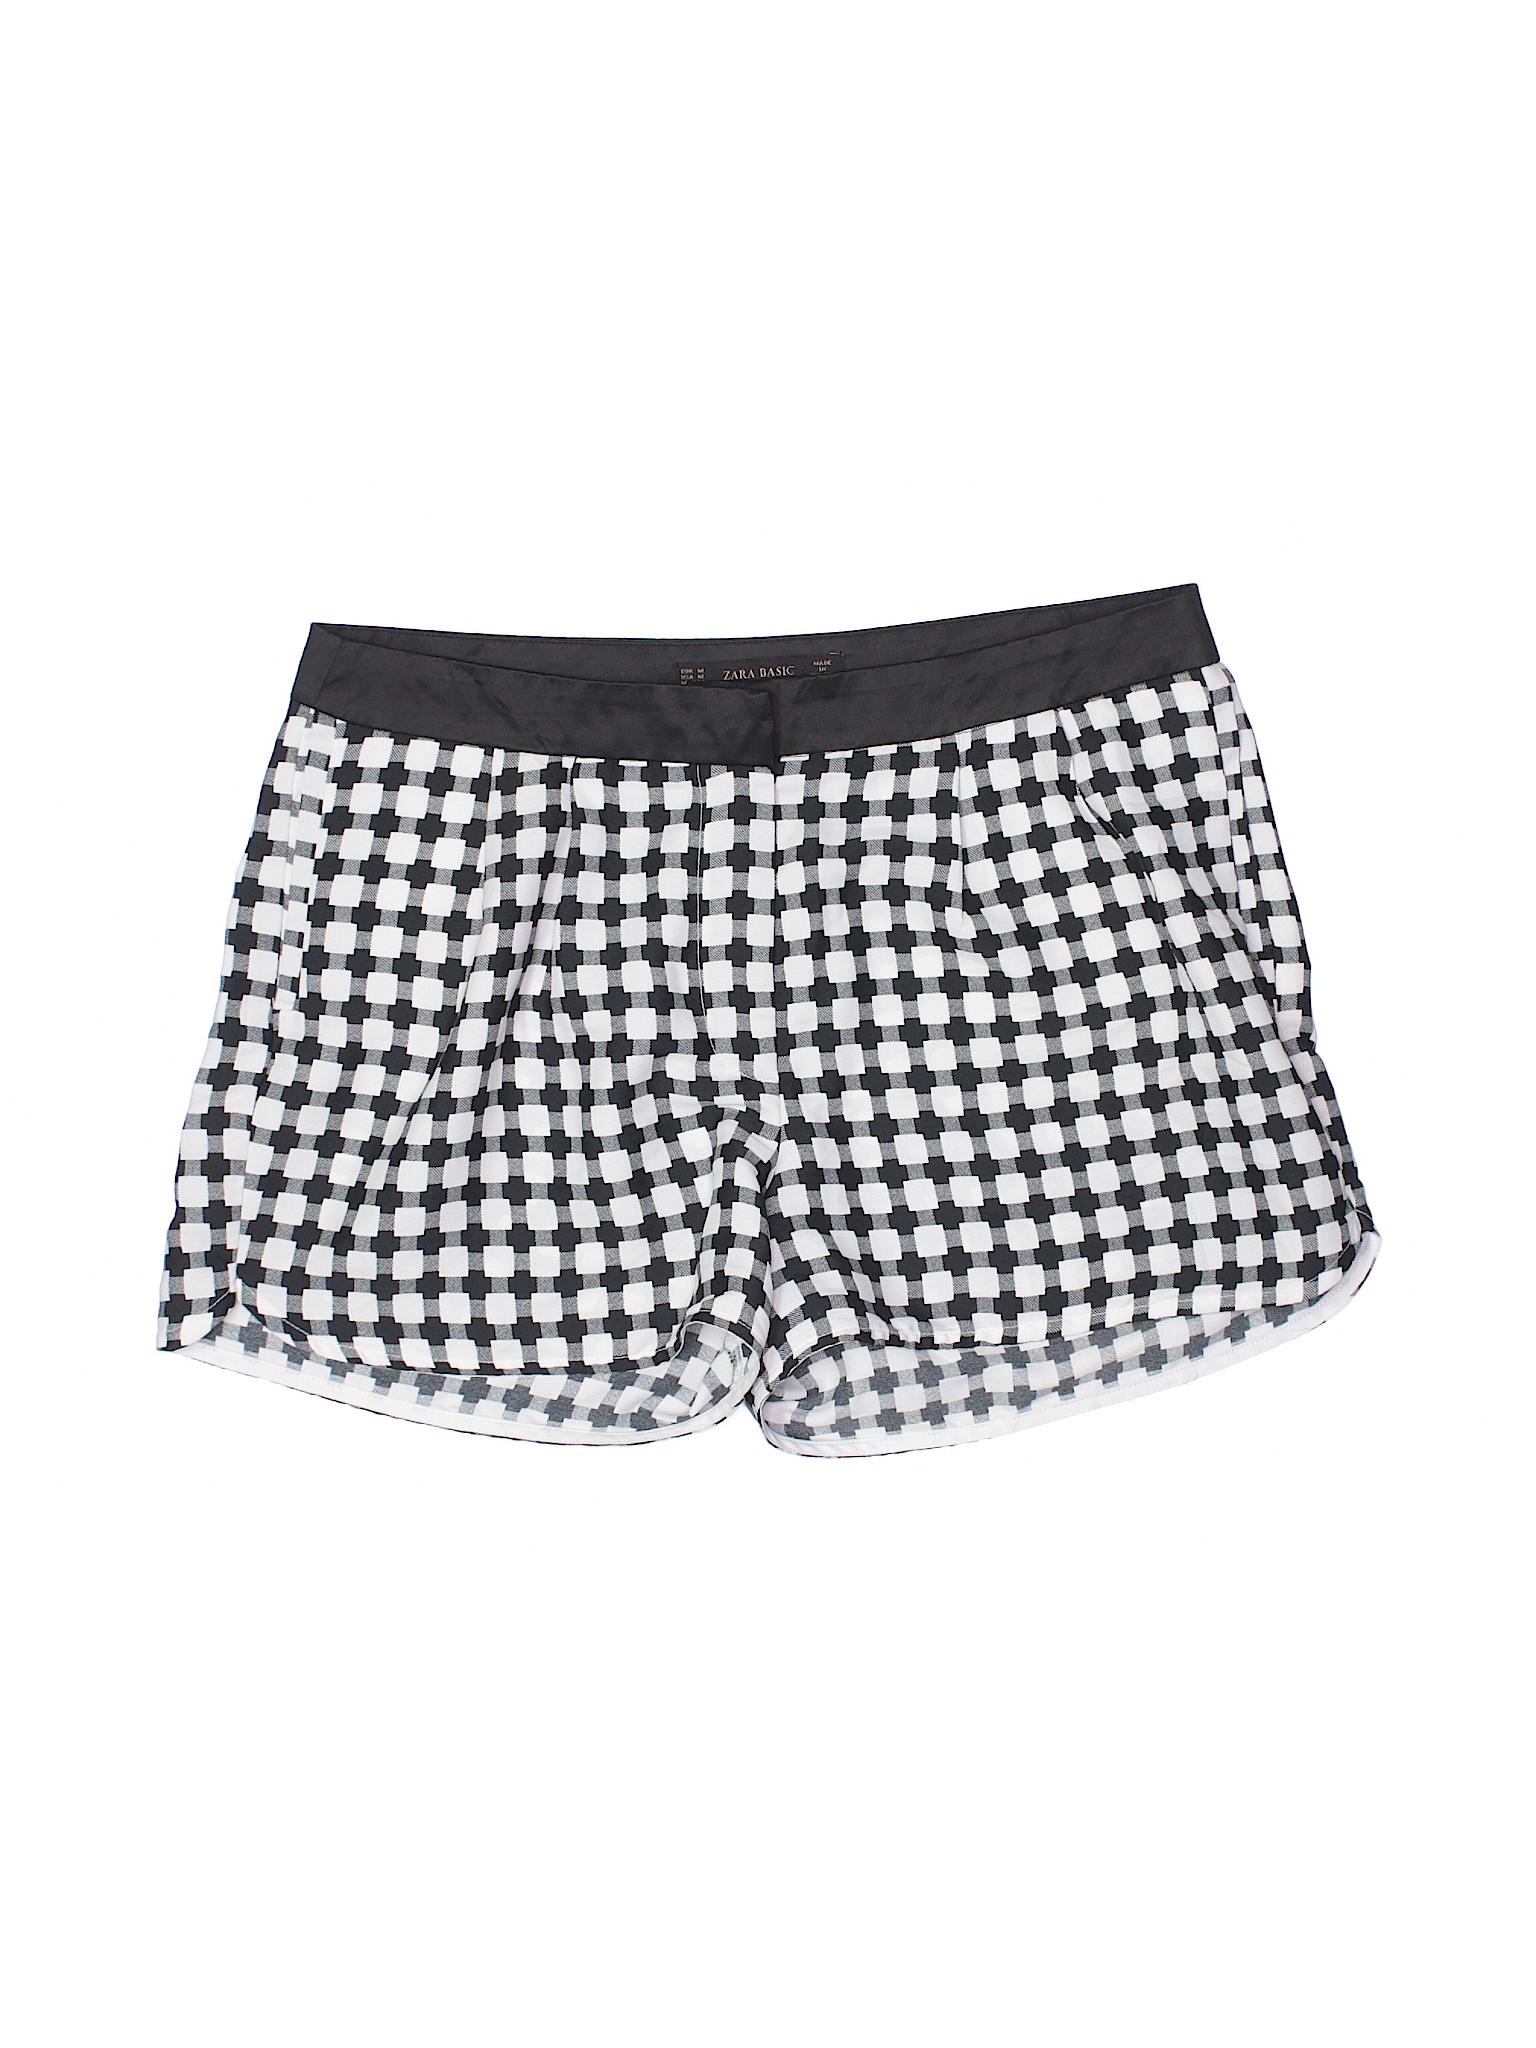 Basic Shorts Shorts Zara Shorts Zara Boutique Boutique Basic Zara Zara Boutique Shorts Basic Boutique Basic Boutique ABSqdAwz